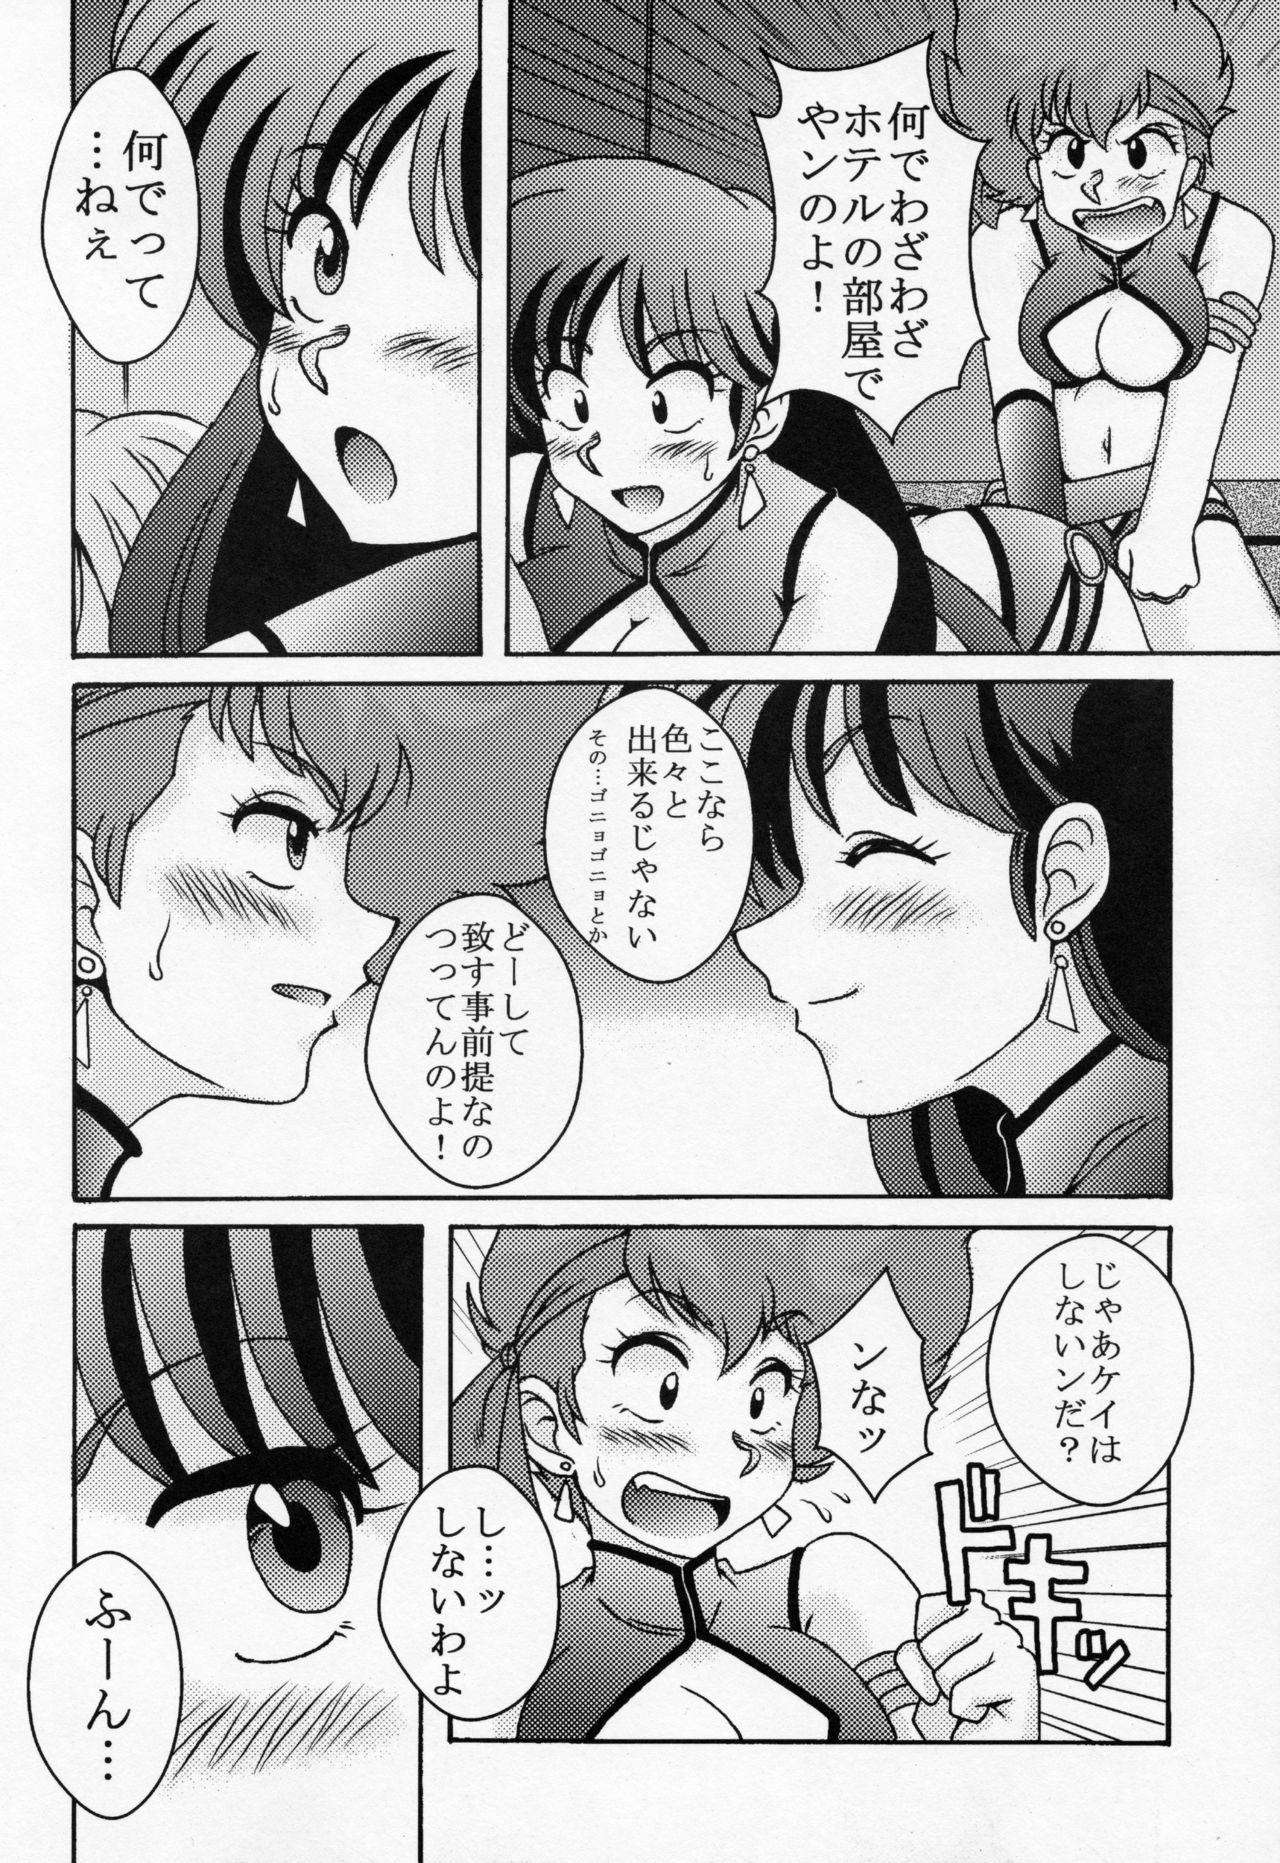 Kei to Yuri 4